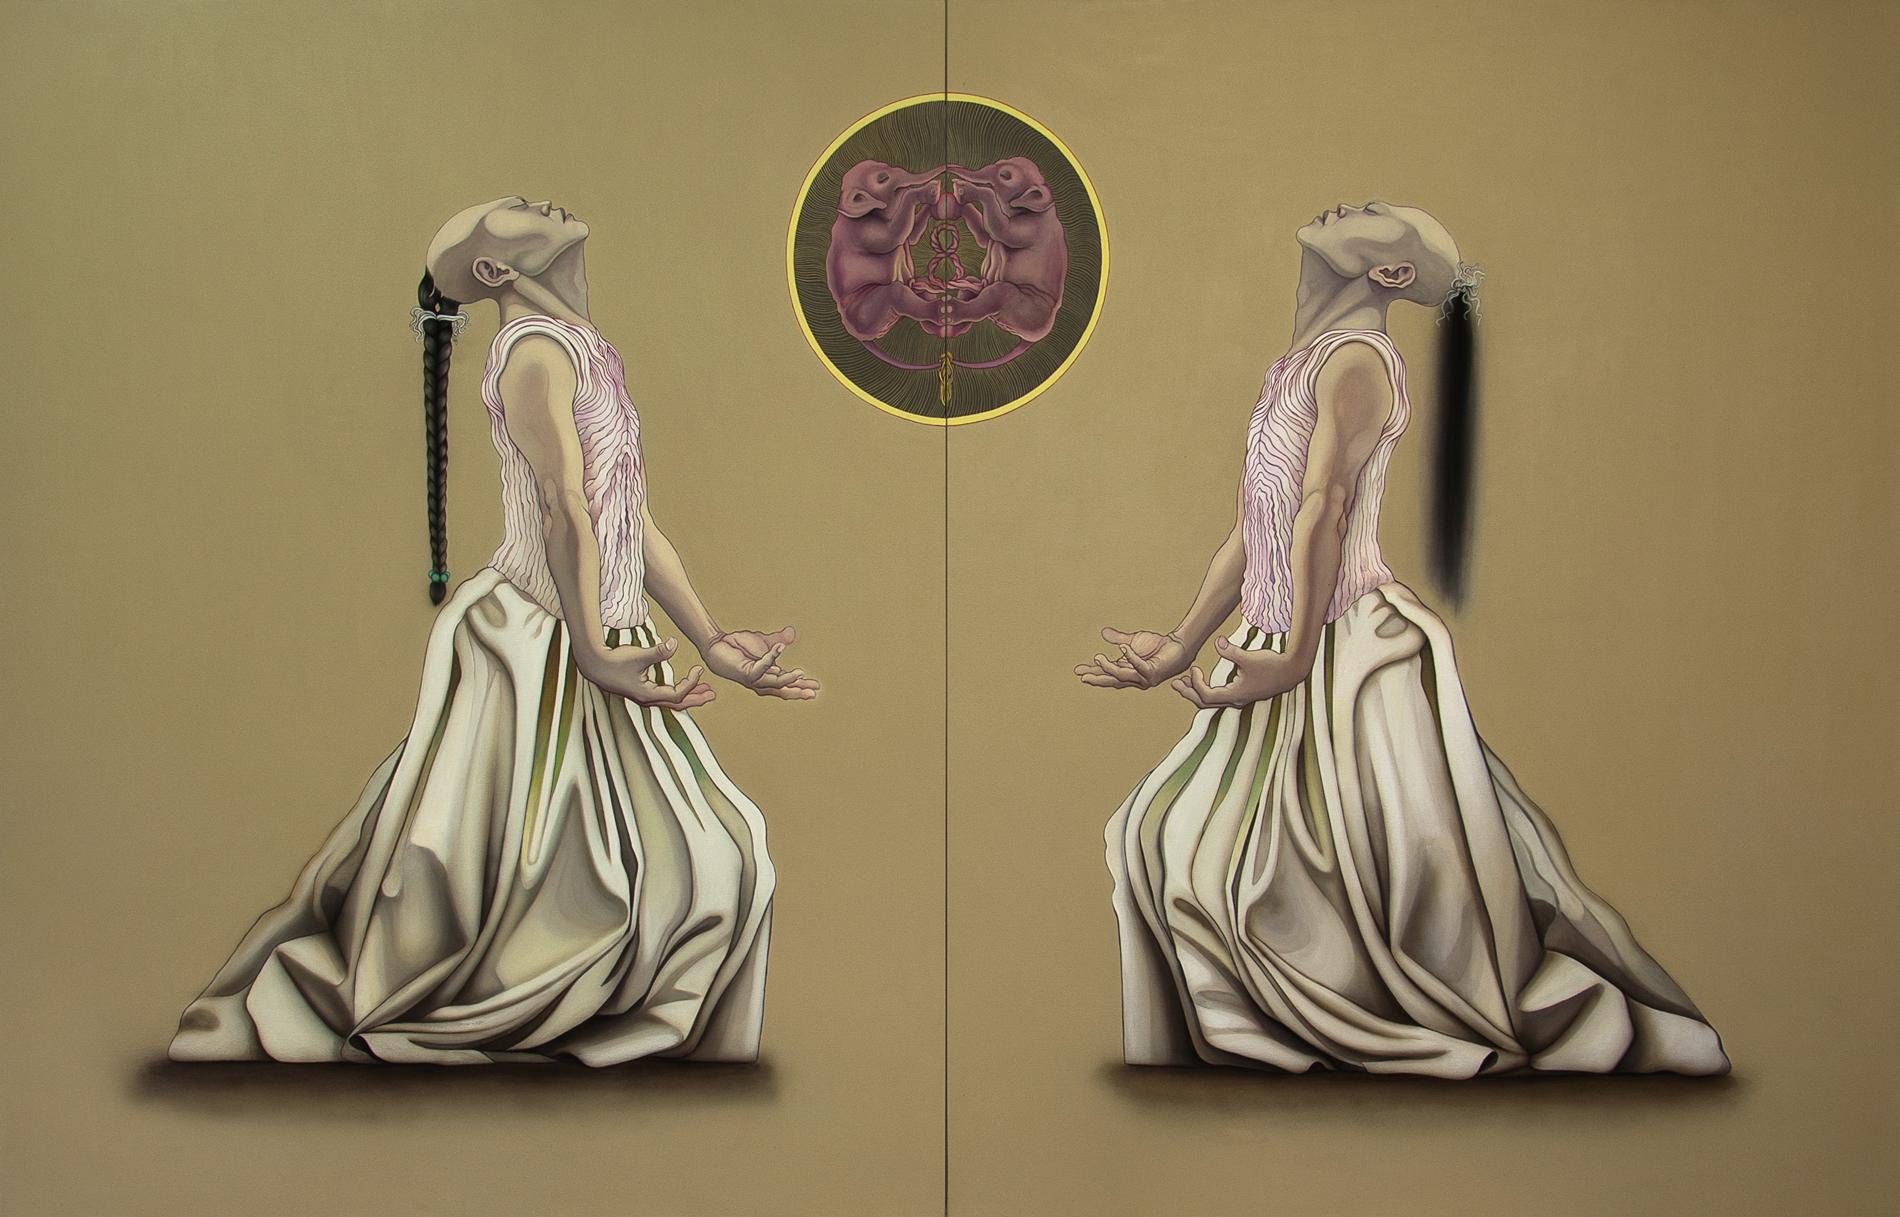 backwoods-gallery-exhibition-phantom-pain-painting-ancestral-memory-by-dante-horoiwa.jpg